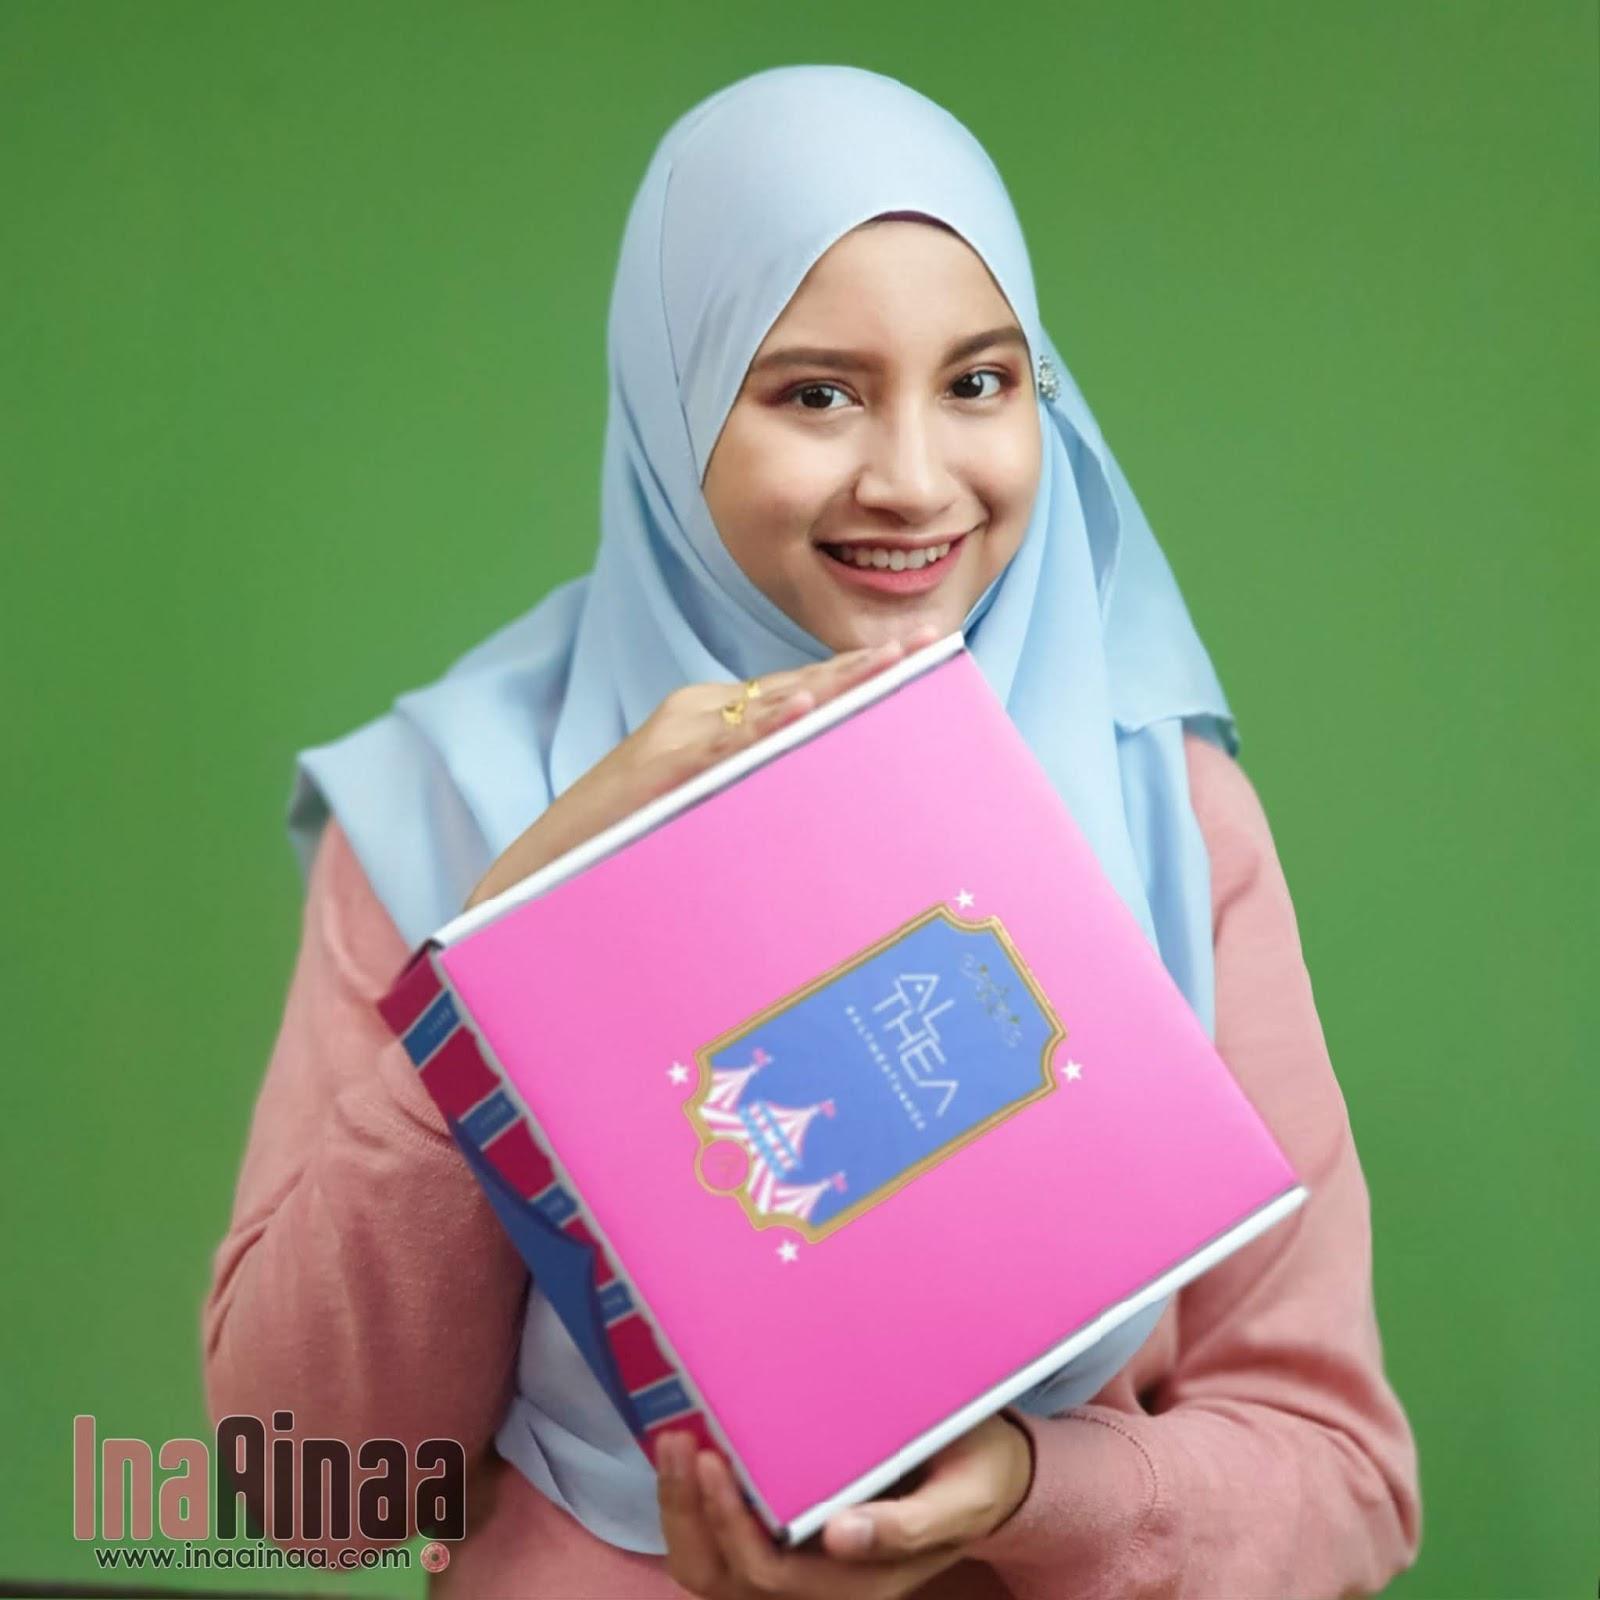 BIRTHDAY ALTHEA KE 4 TAHUN - Hak Milik Ina Ainaa